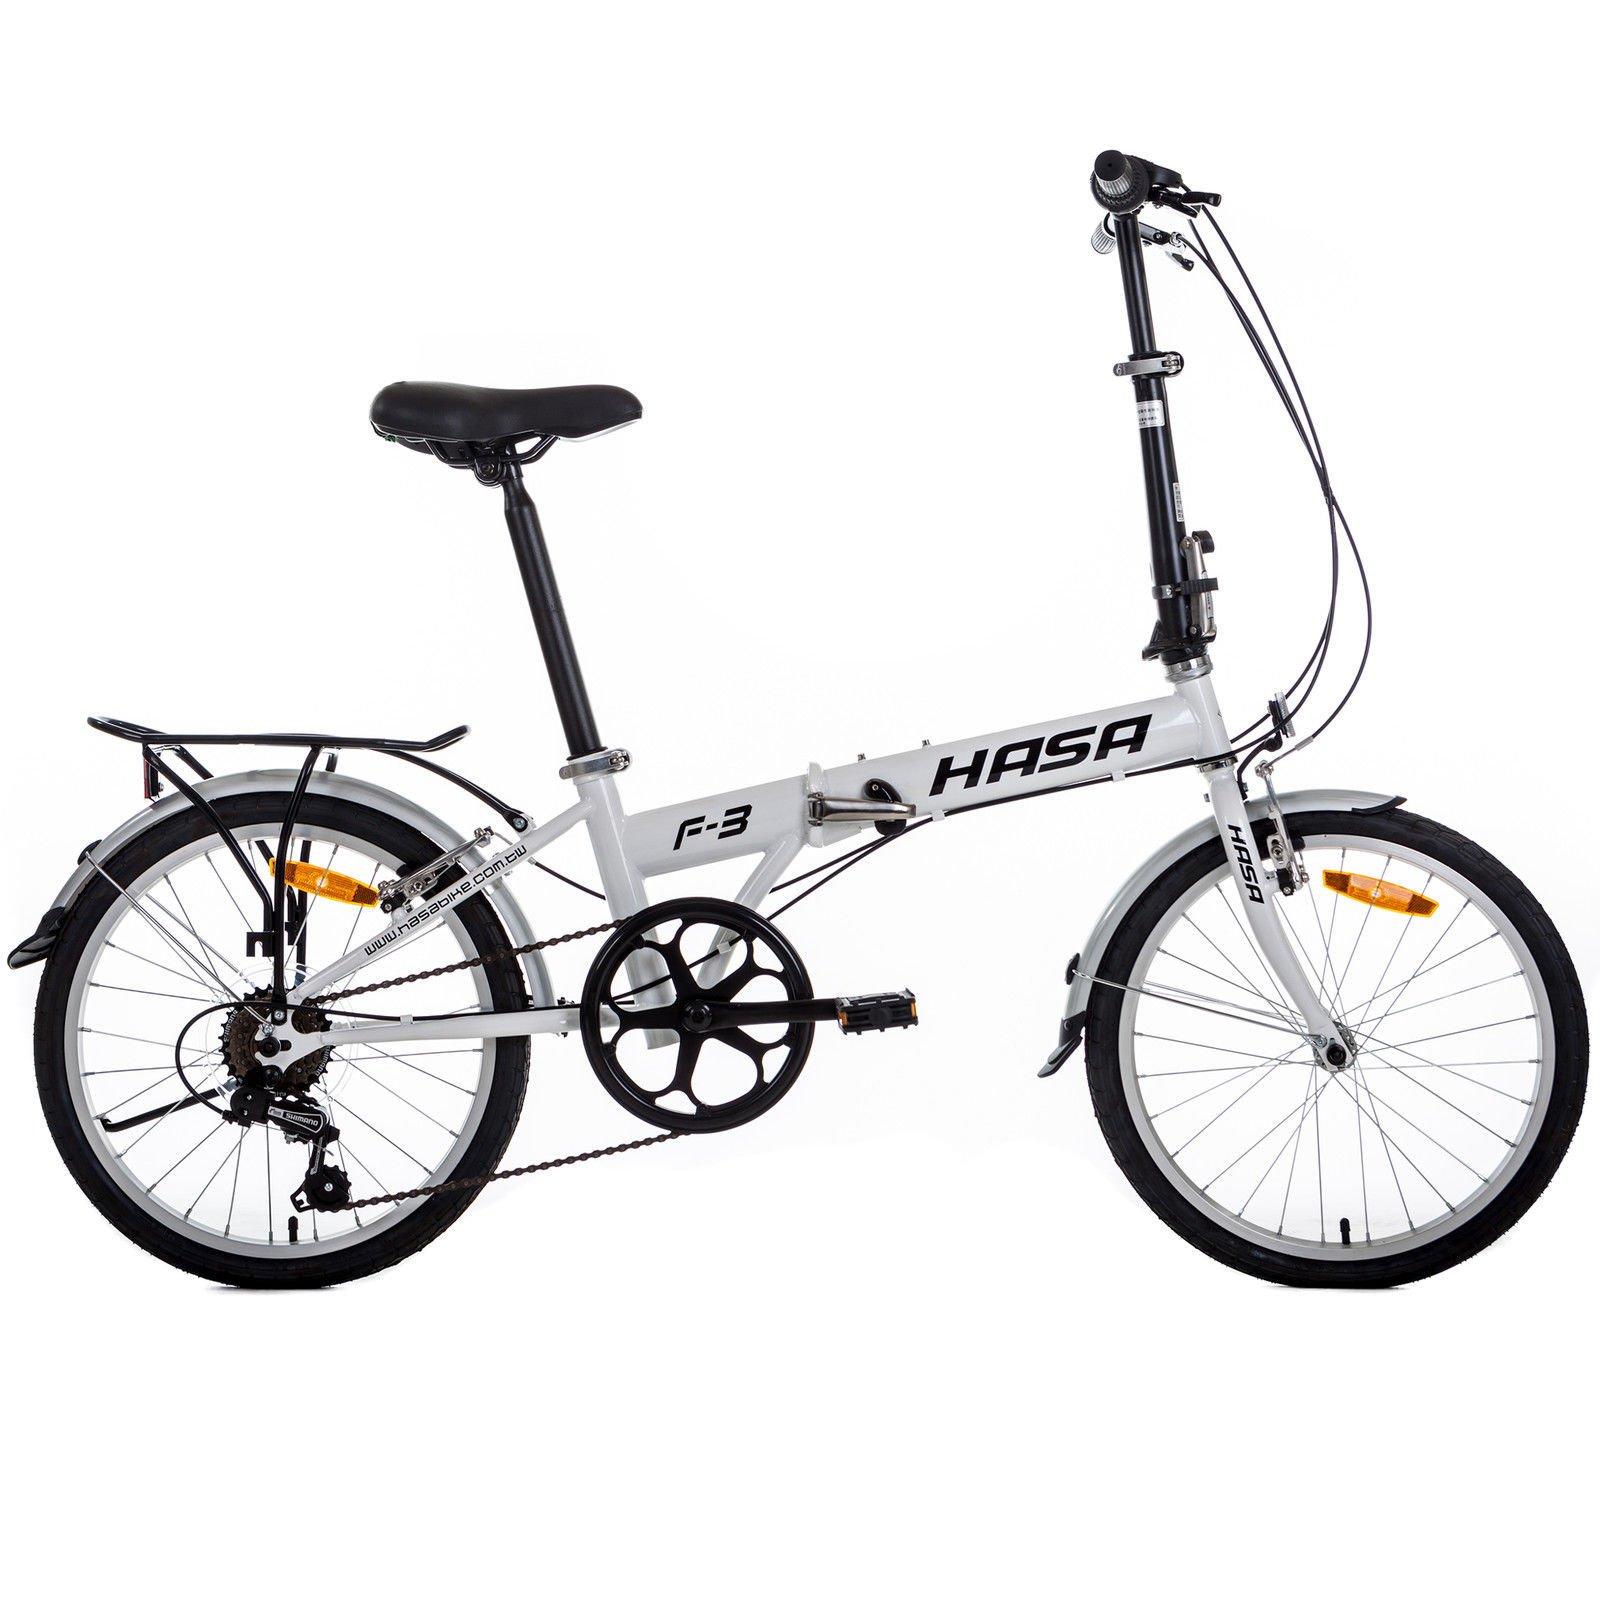 HASA Folding Foldable Bike Sram 6 Speed White